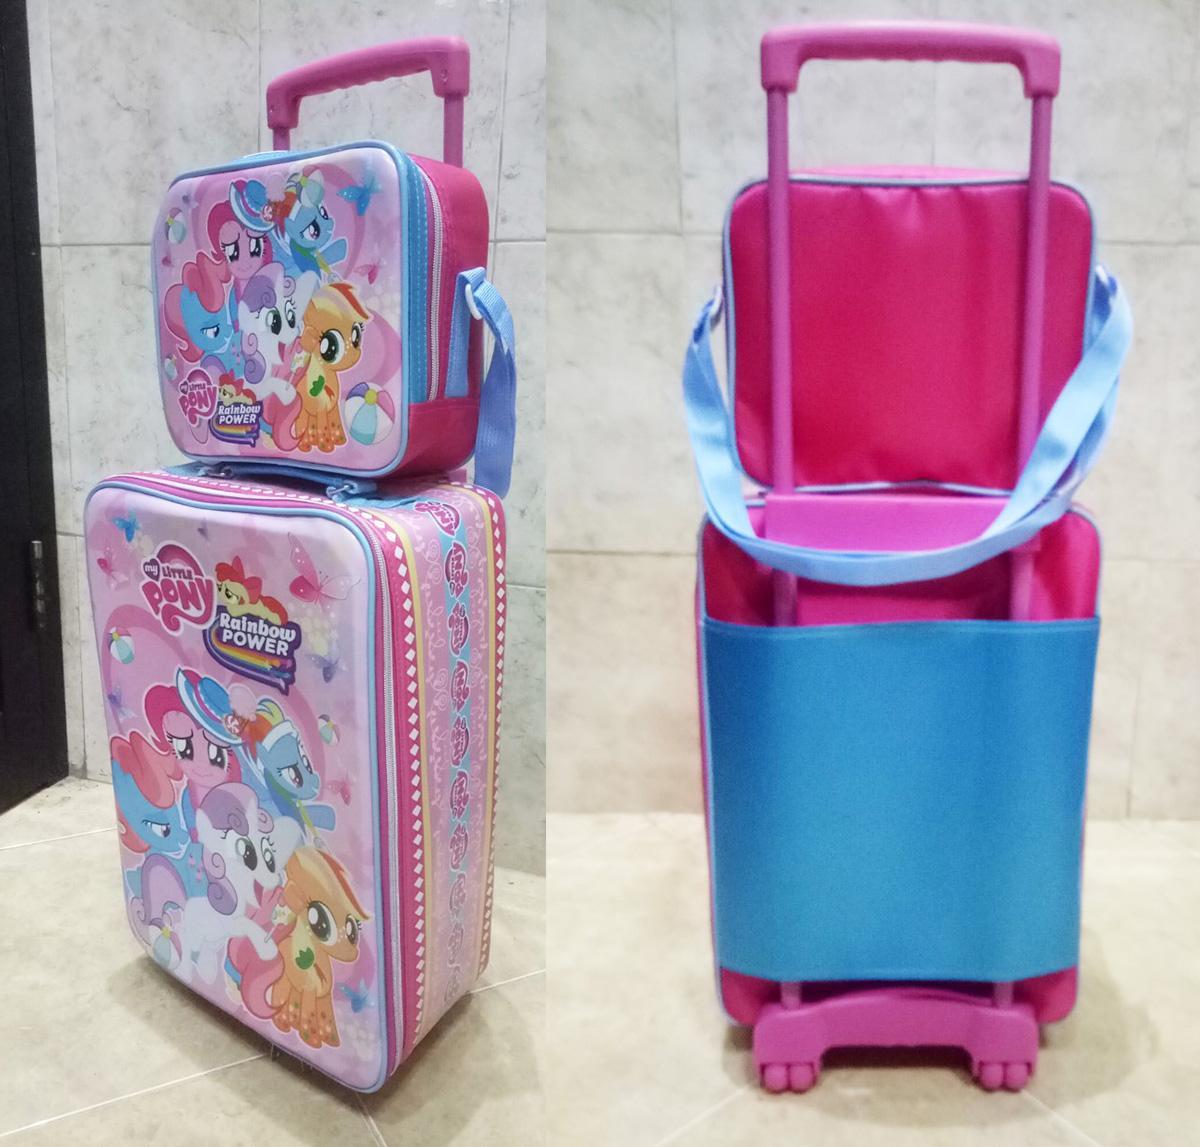 Onlan Set Koper Lunch Bag Karakter Anak Perempuan Bahan Kain Sponge Tahan Air New Arrival By Abadi Jaya.